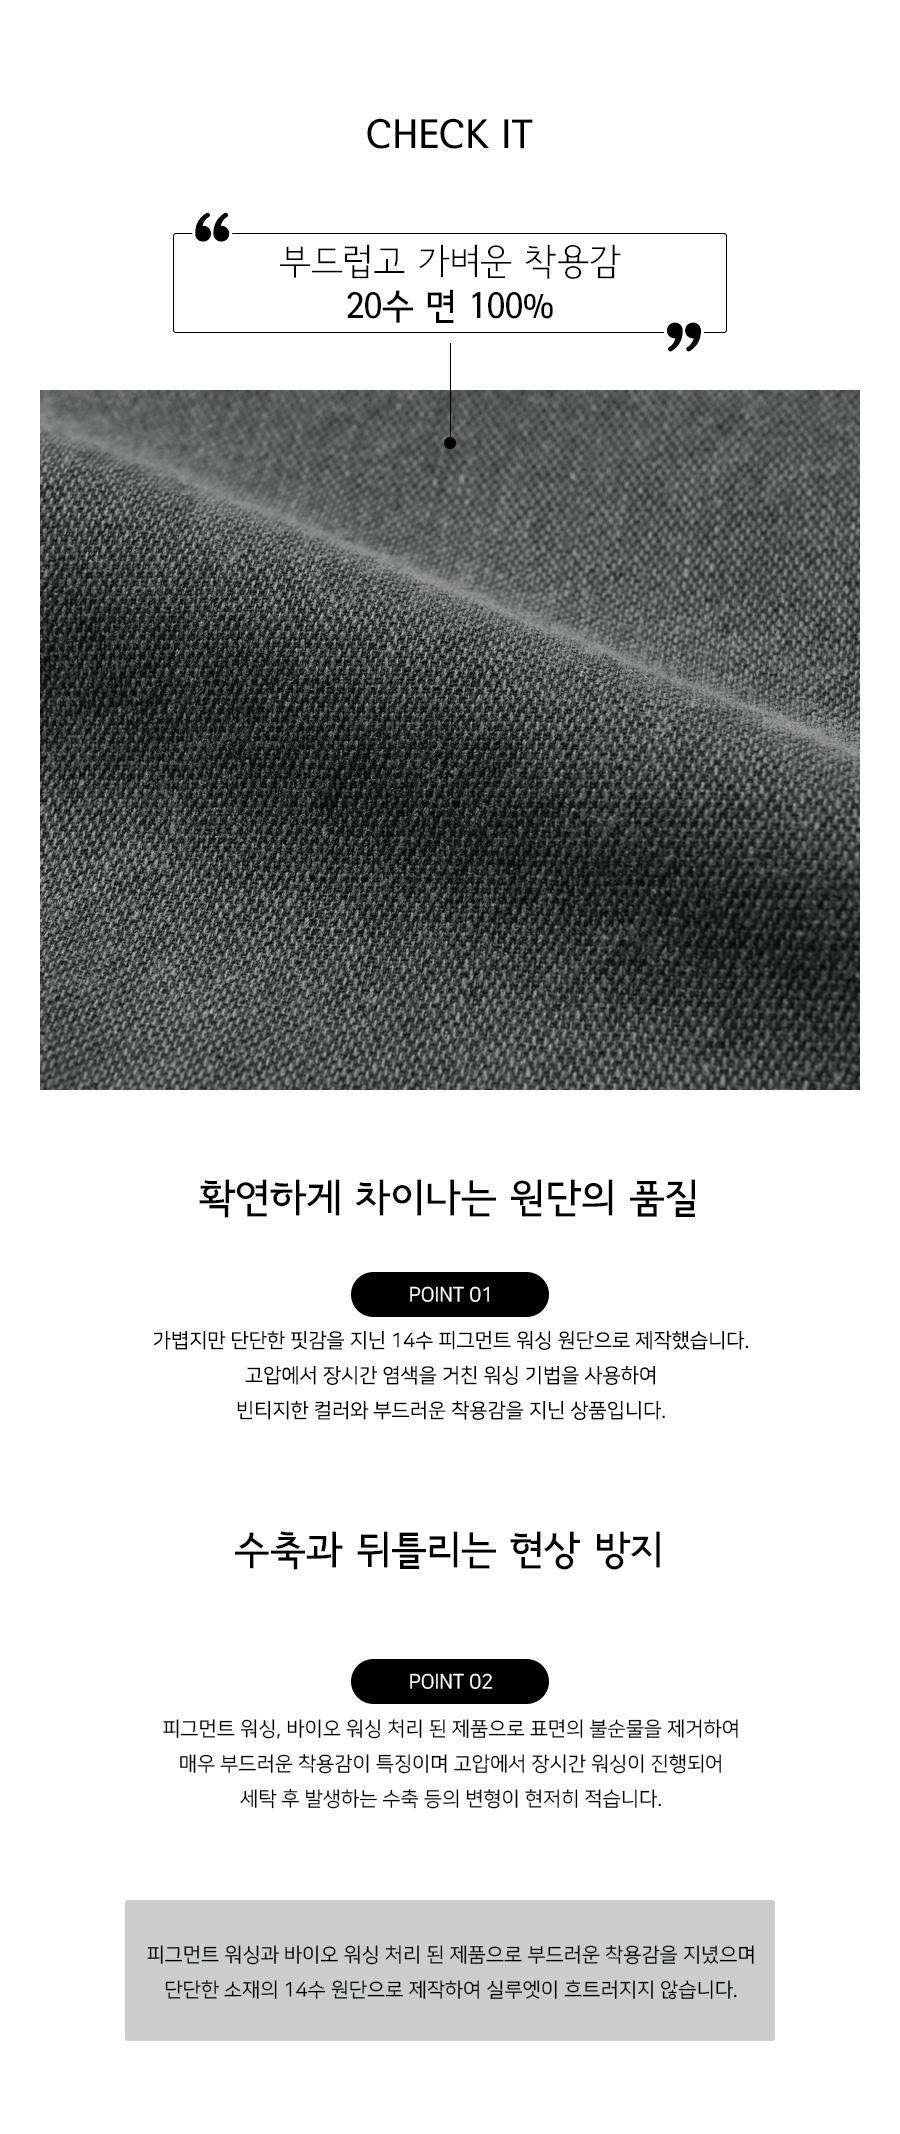 4079_info_darkgray_bj.jpg